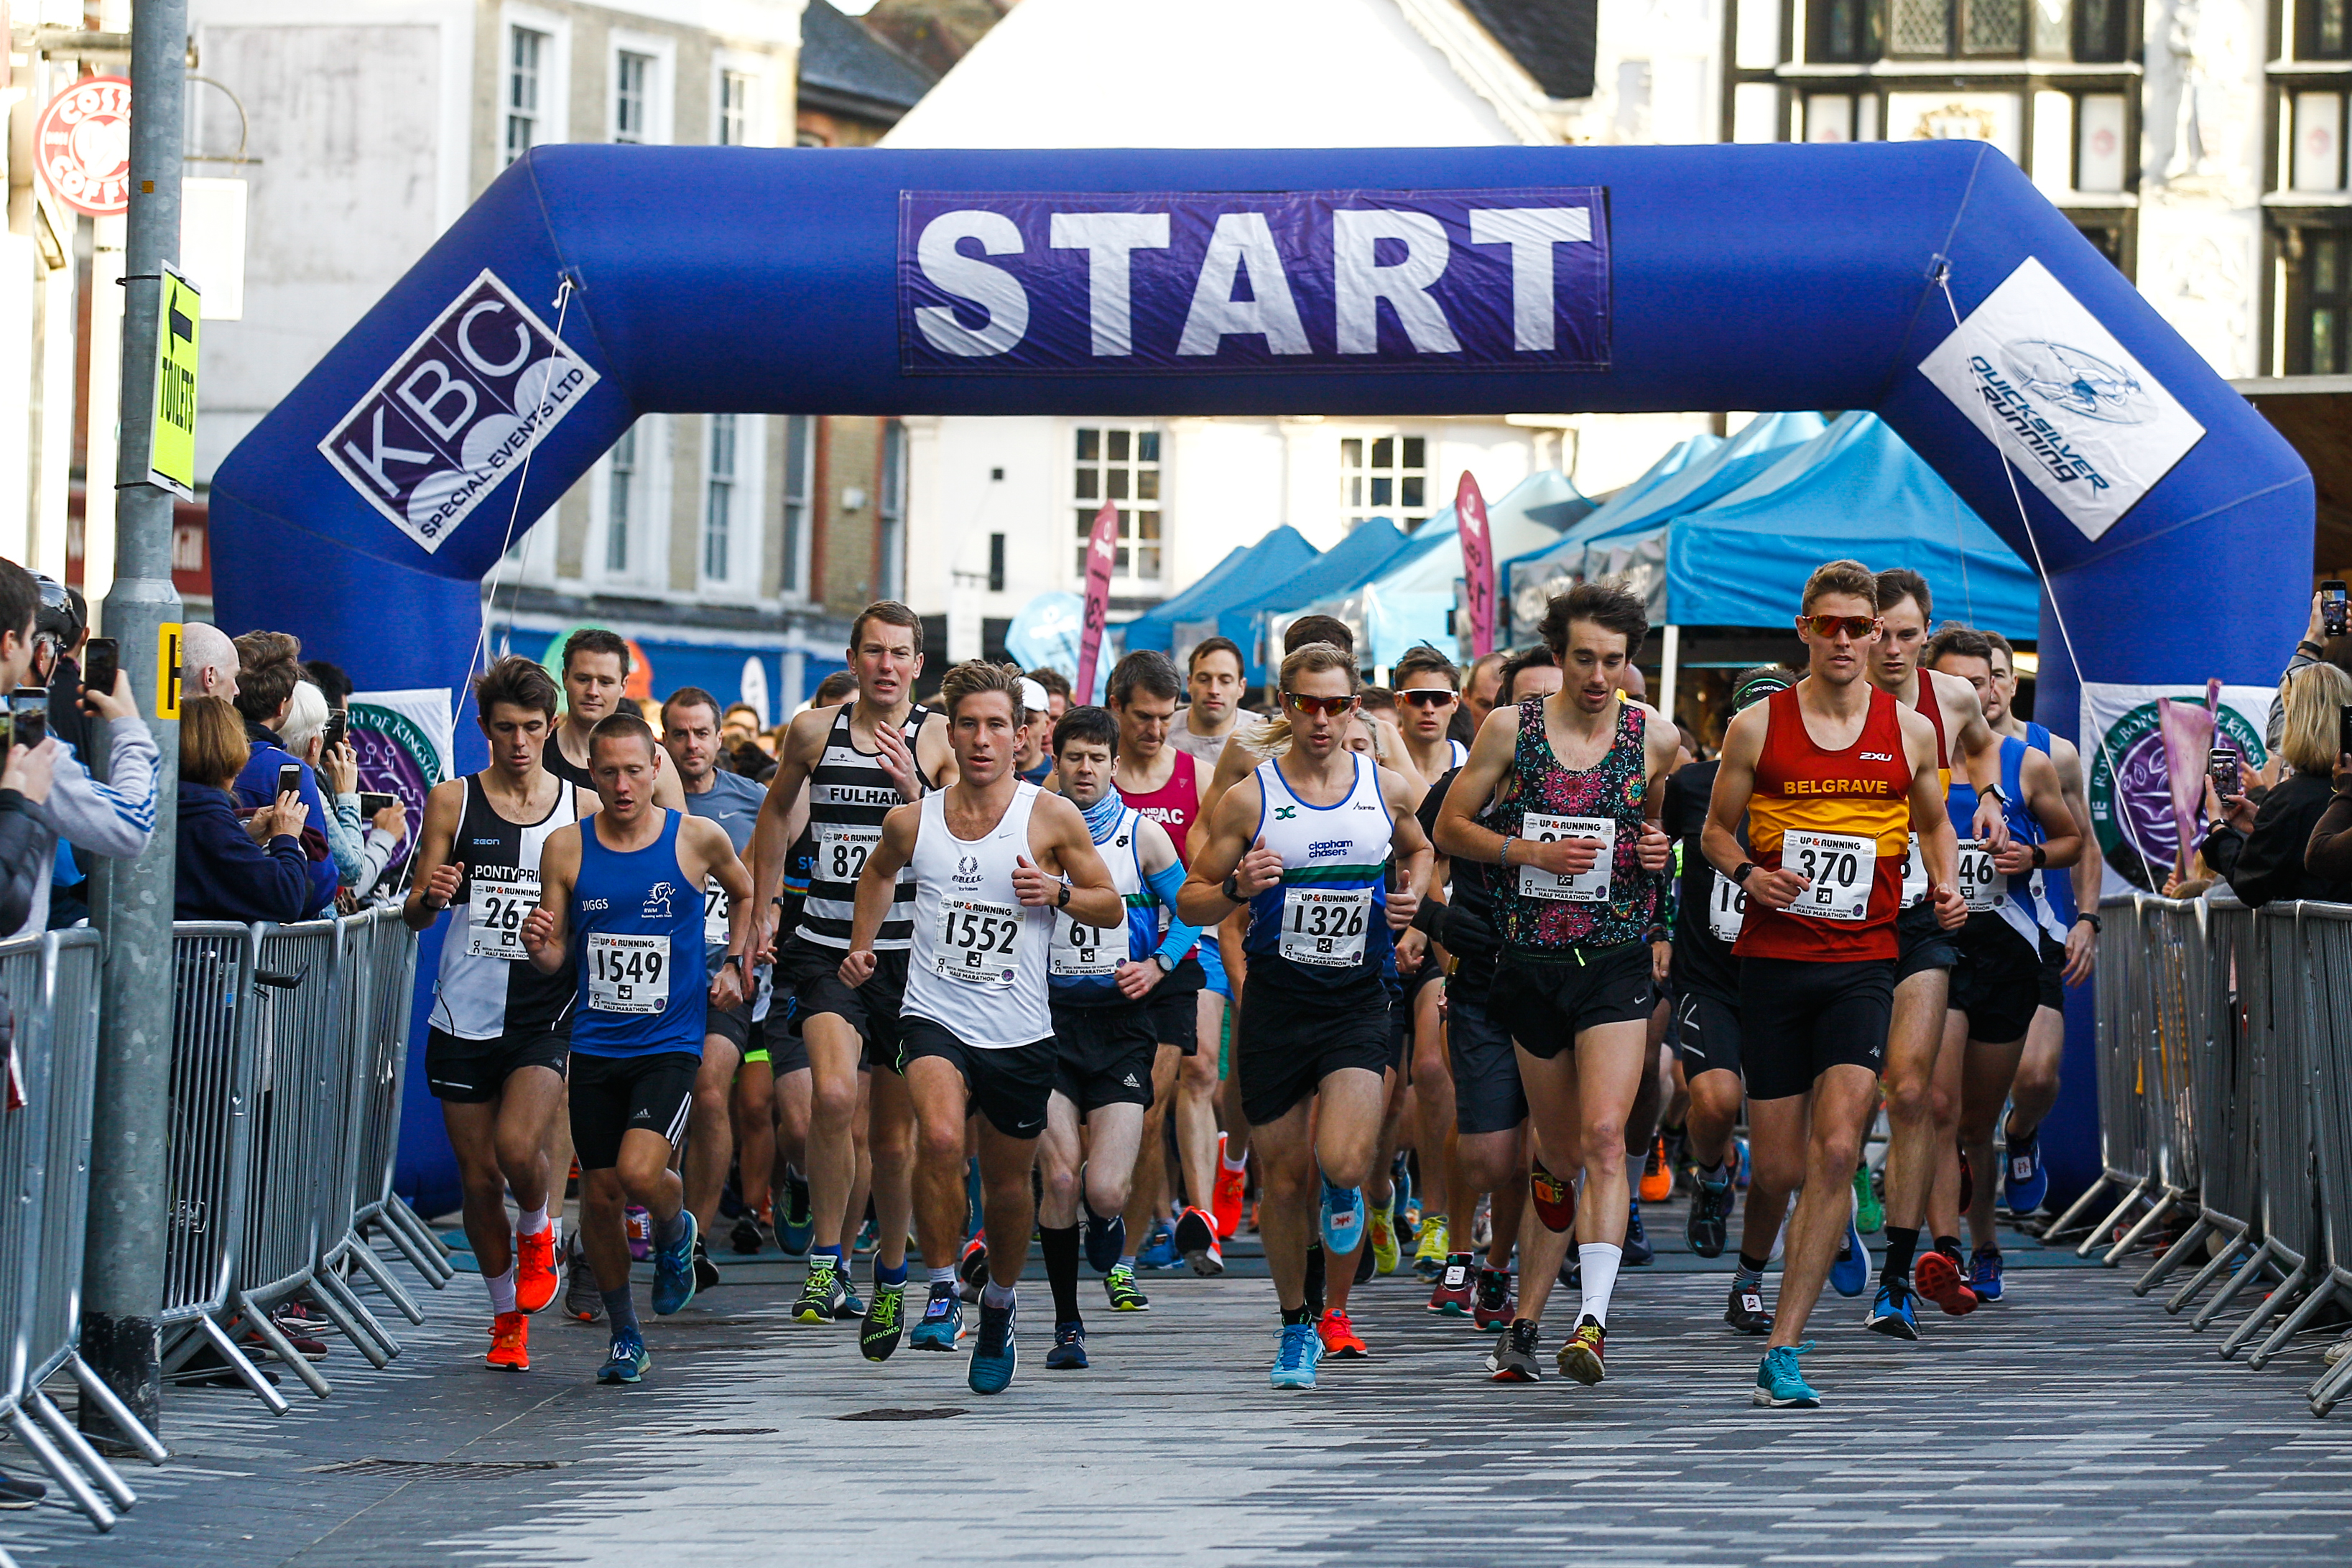 The Royal Borough of Kingston Half Marathon - cover image